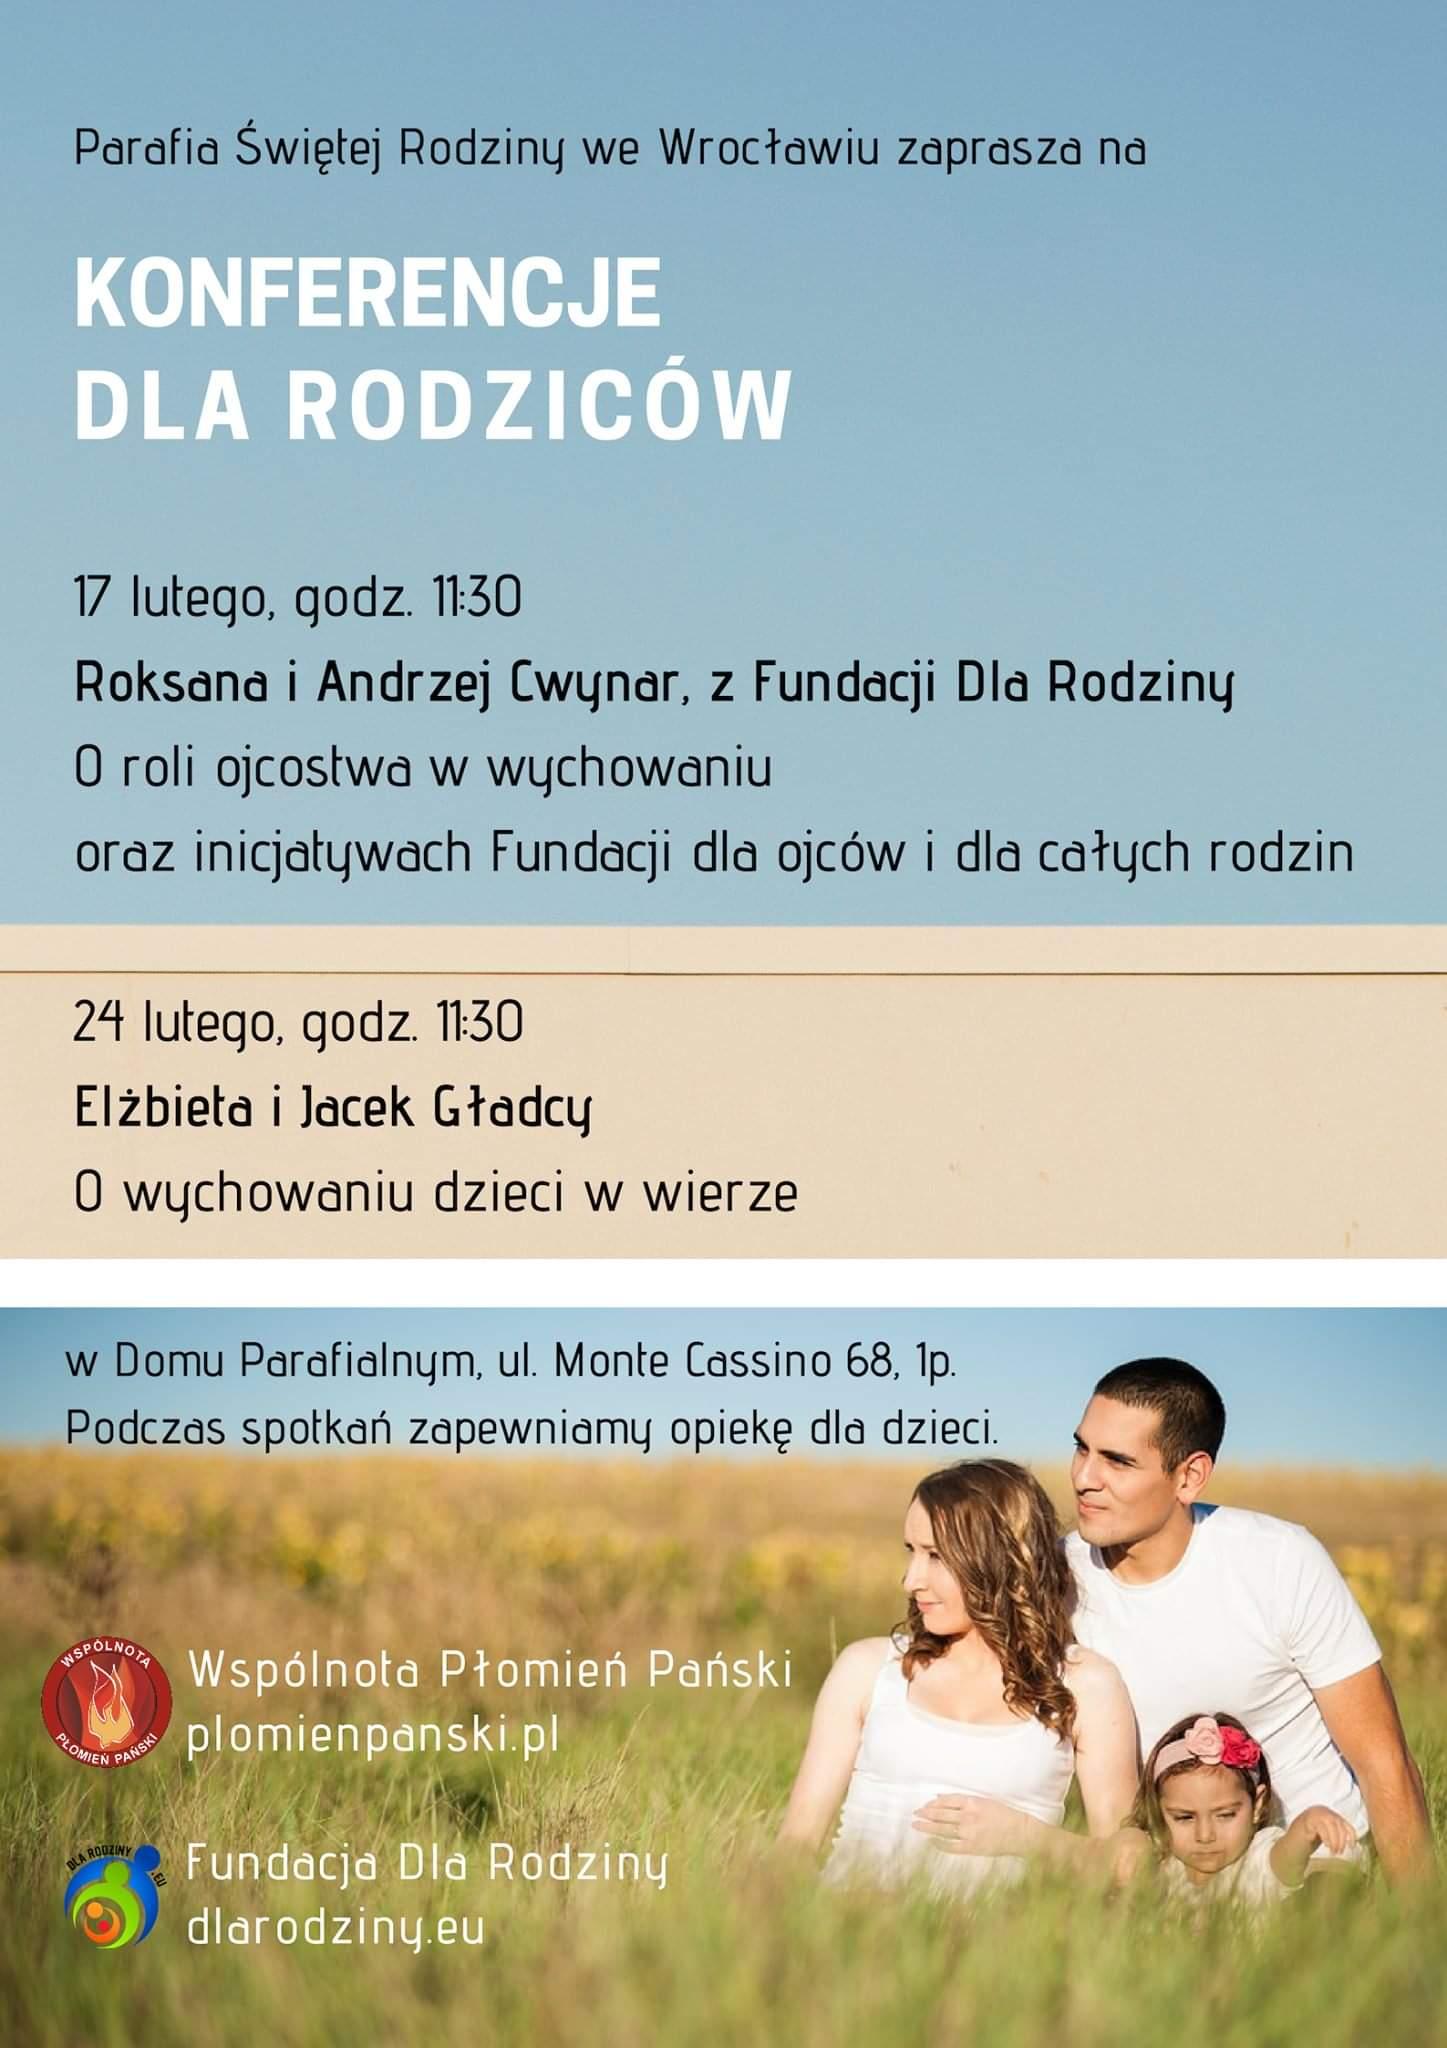 konferencja 02-2019 plakat